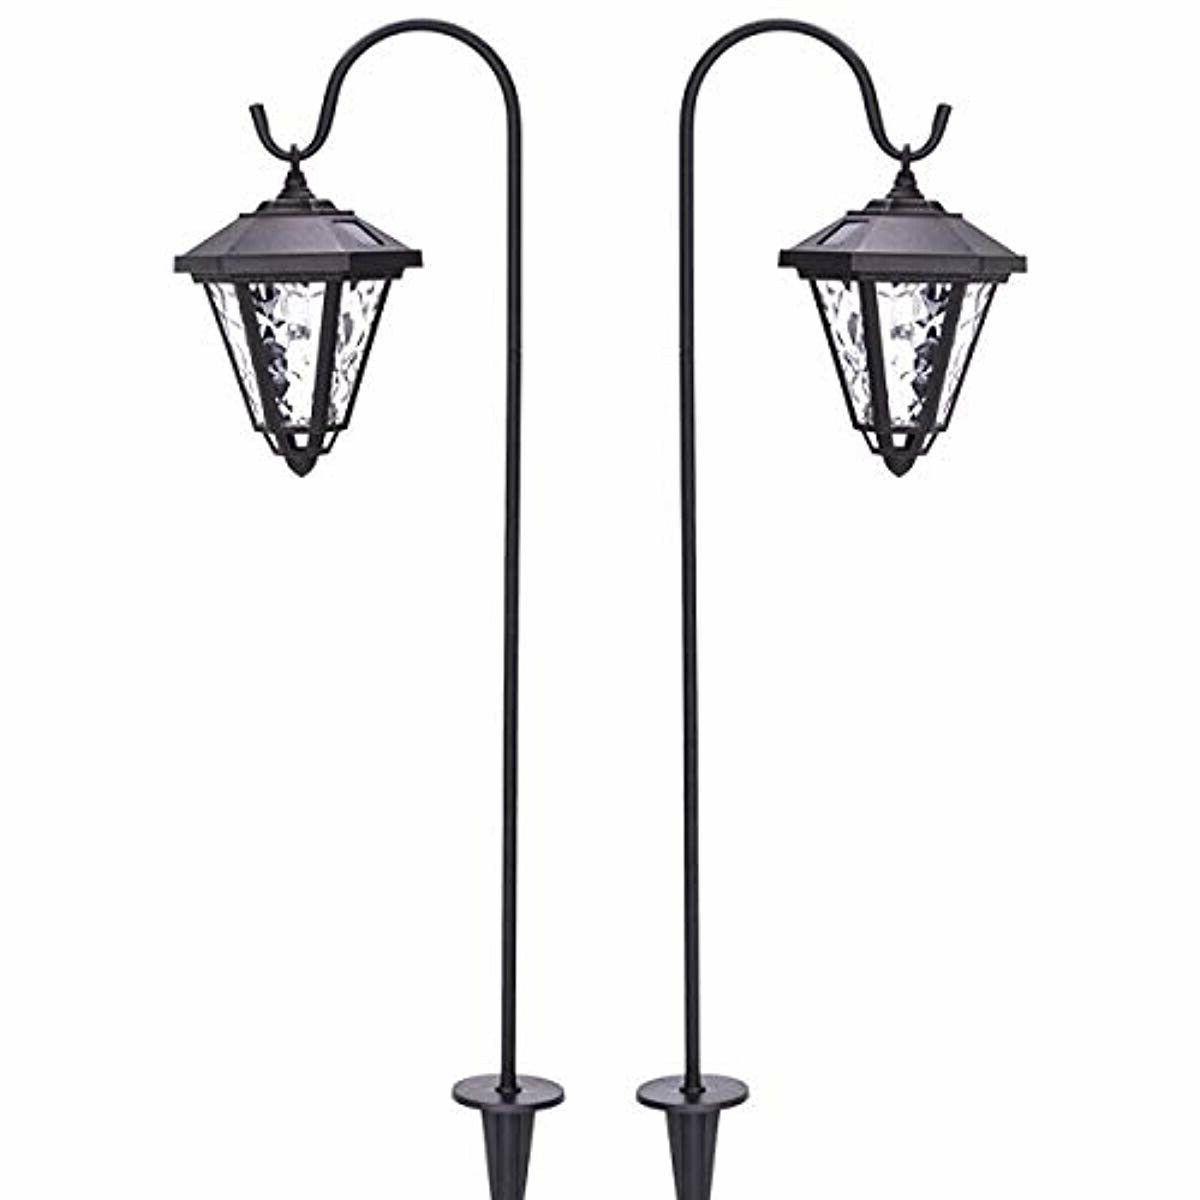 31 5 inch solar lights outdoor hanging